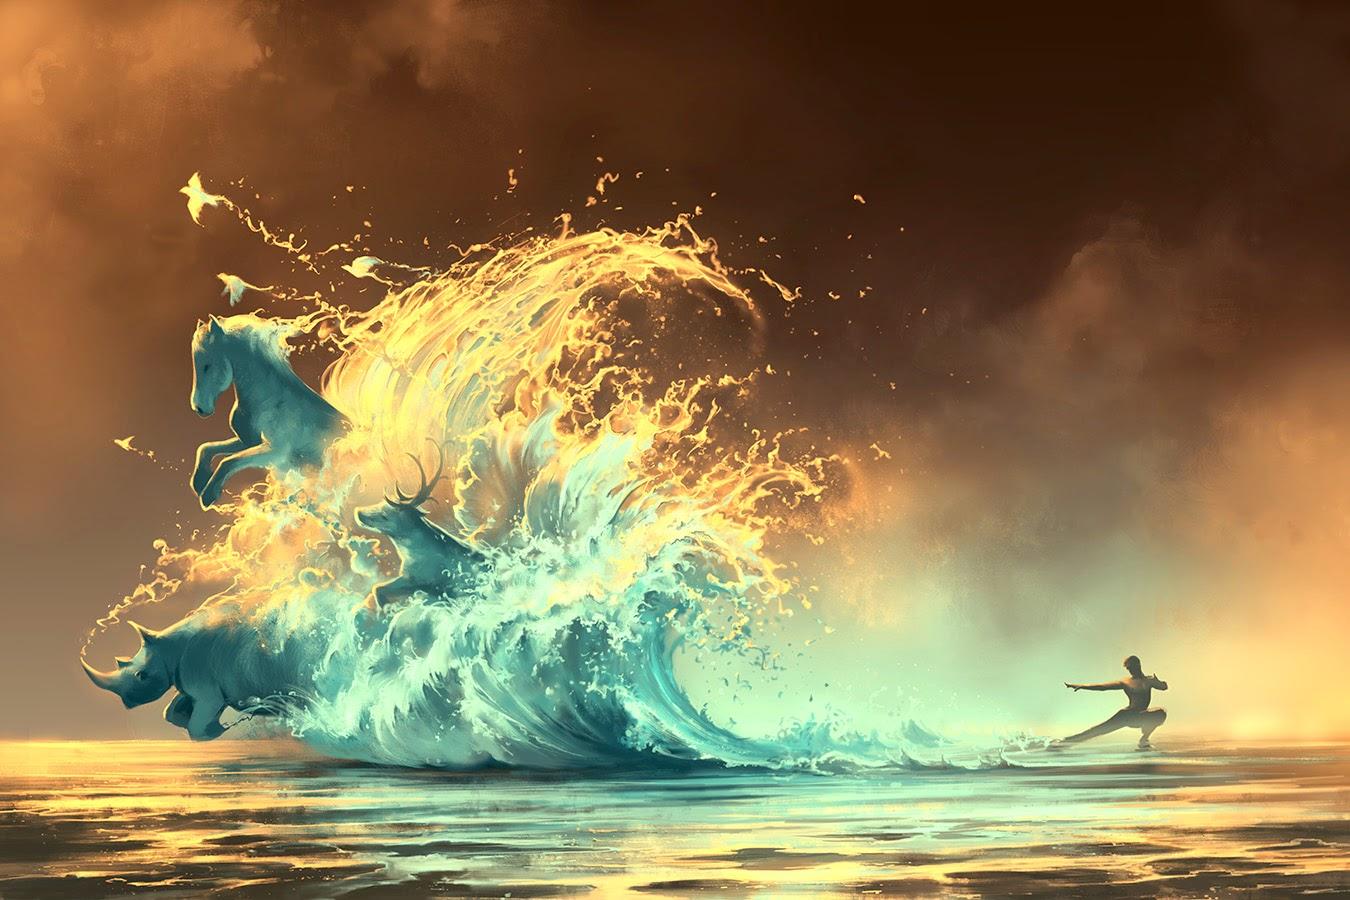 27-Mana-Tide-Rolando-Cyril-aquasixio-Surreal-Fantasy-Otherworldly-Art-www-designstack-co